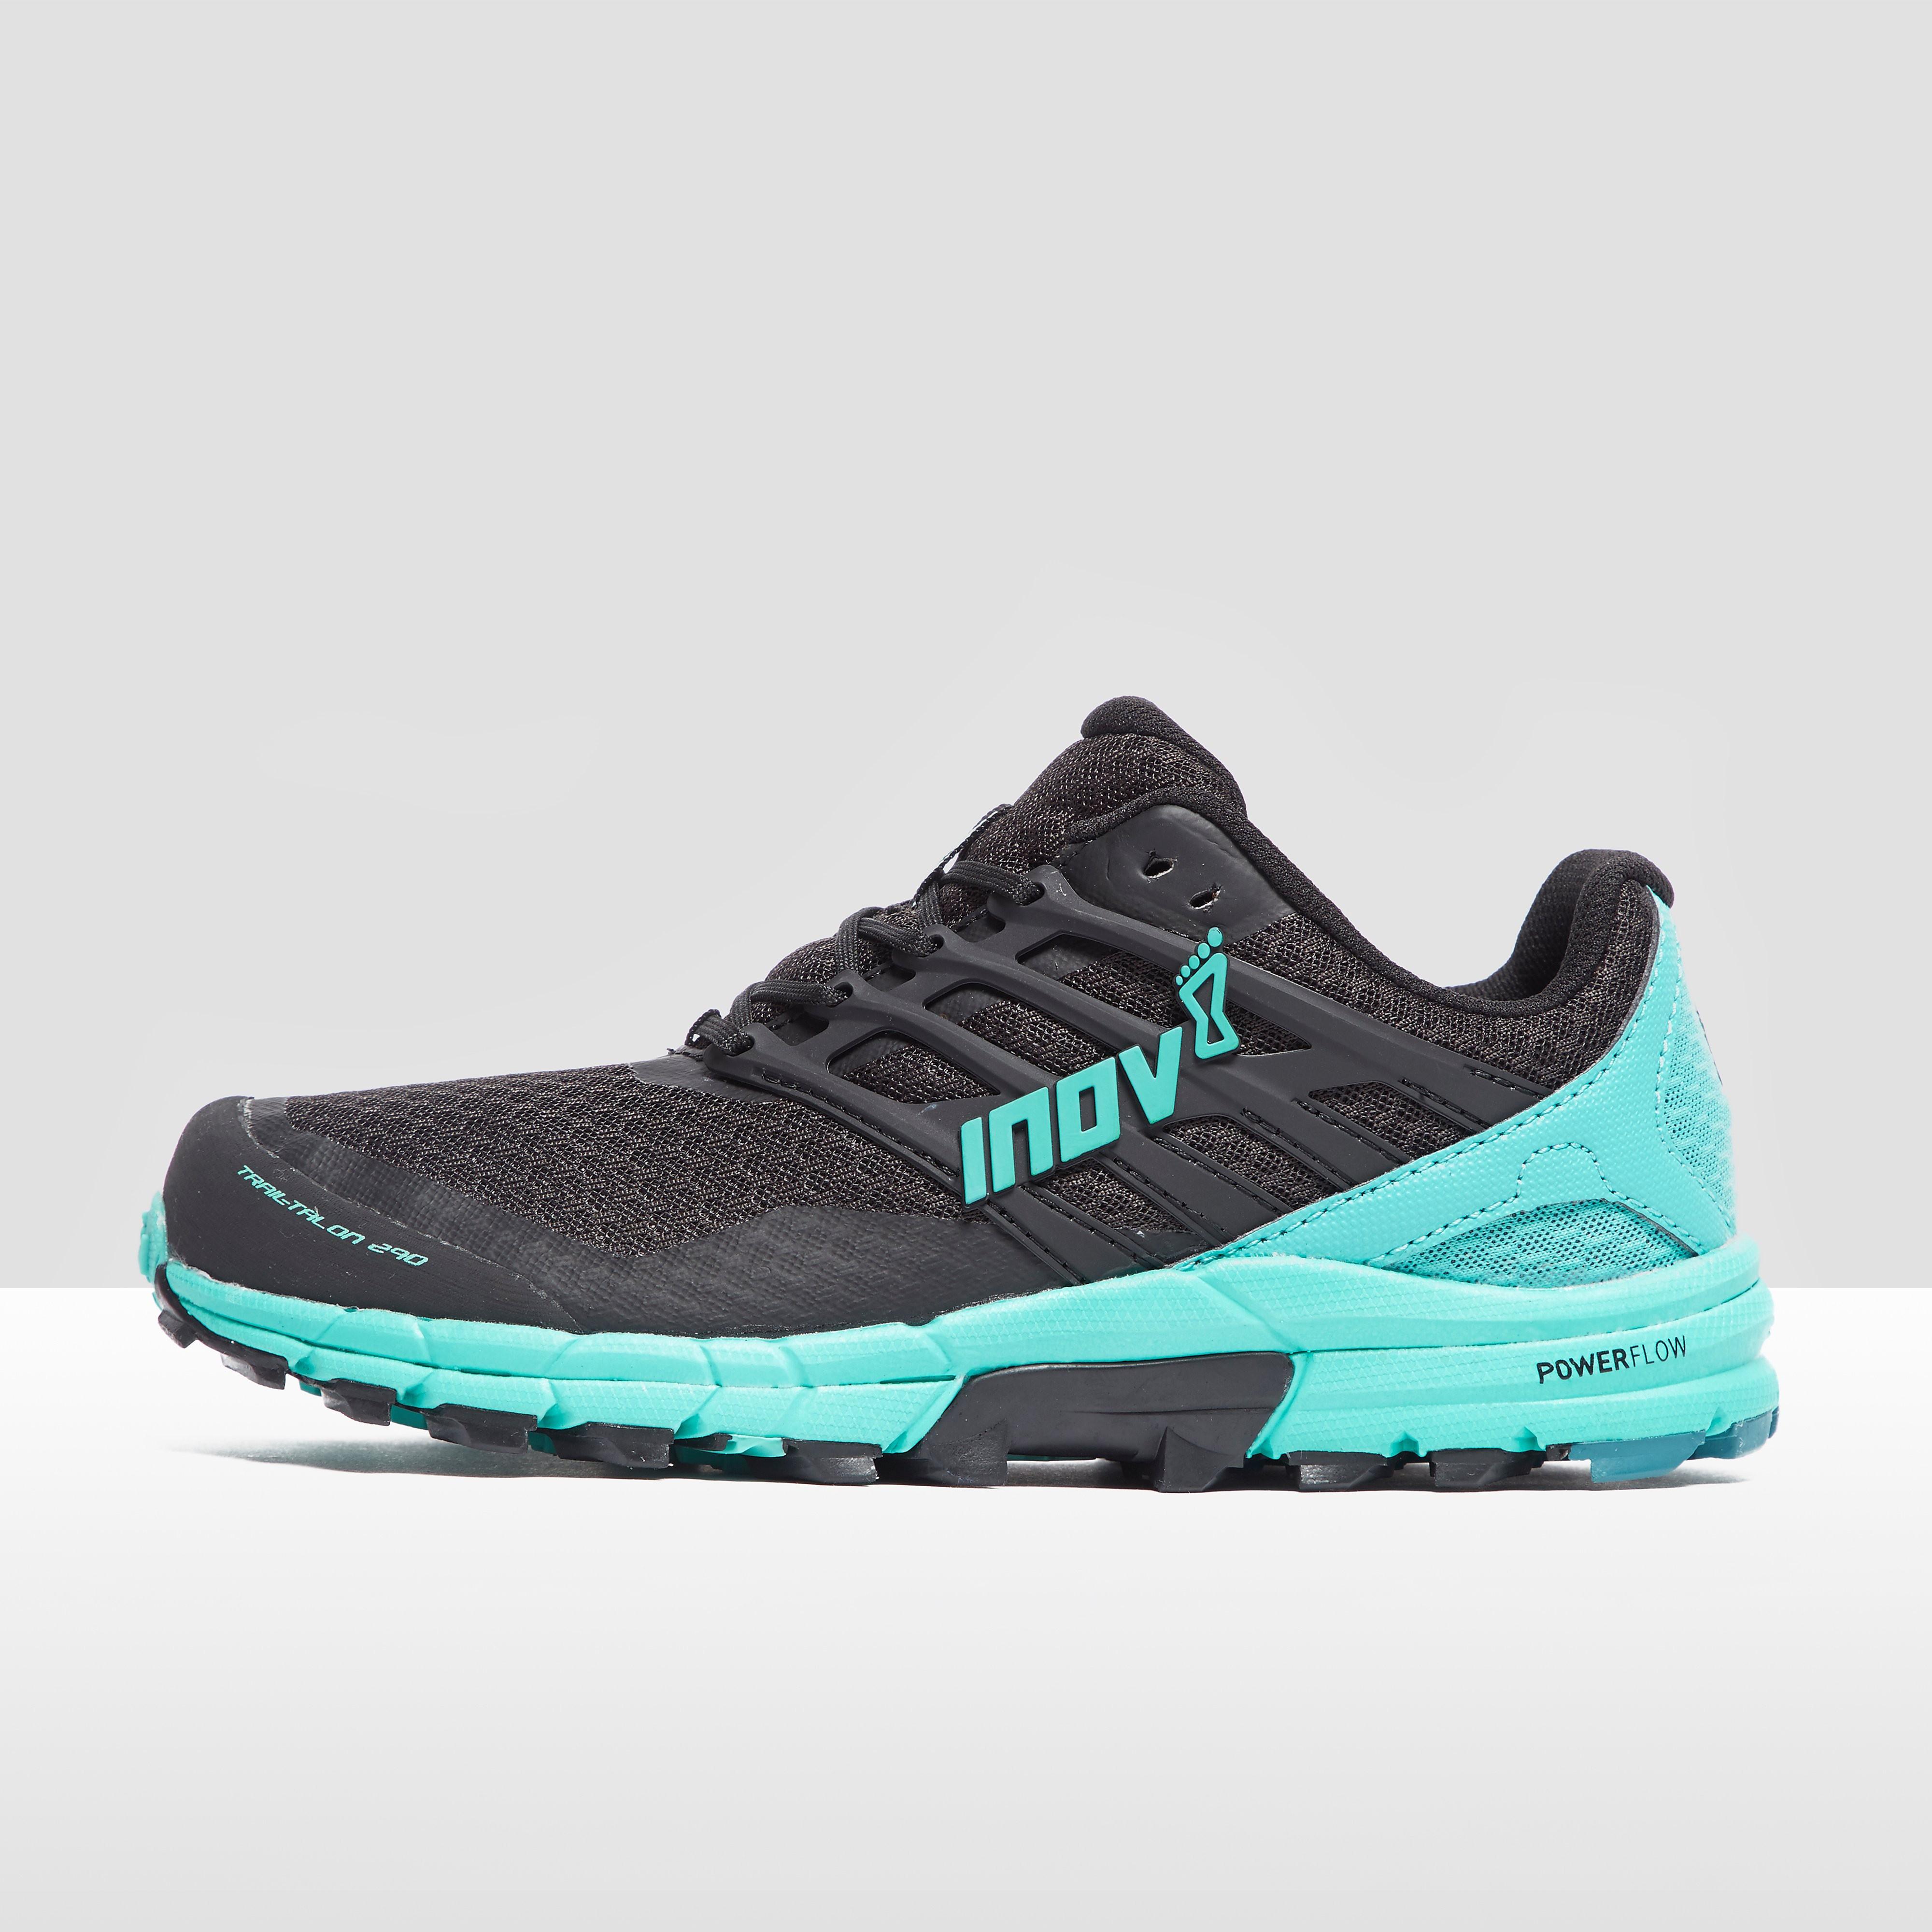 Inov-8 Trailtalon 290 Women's Running Shoes